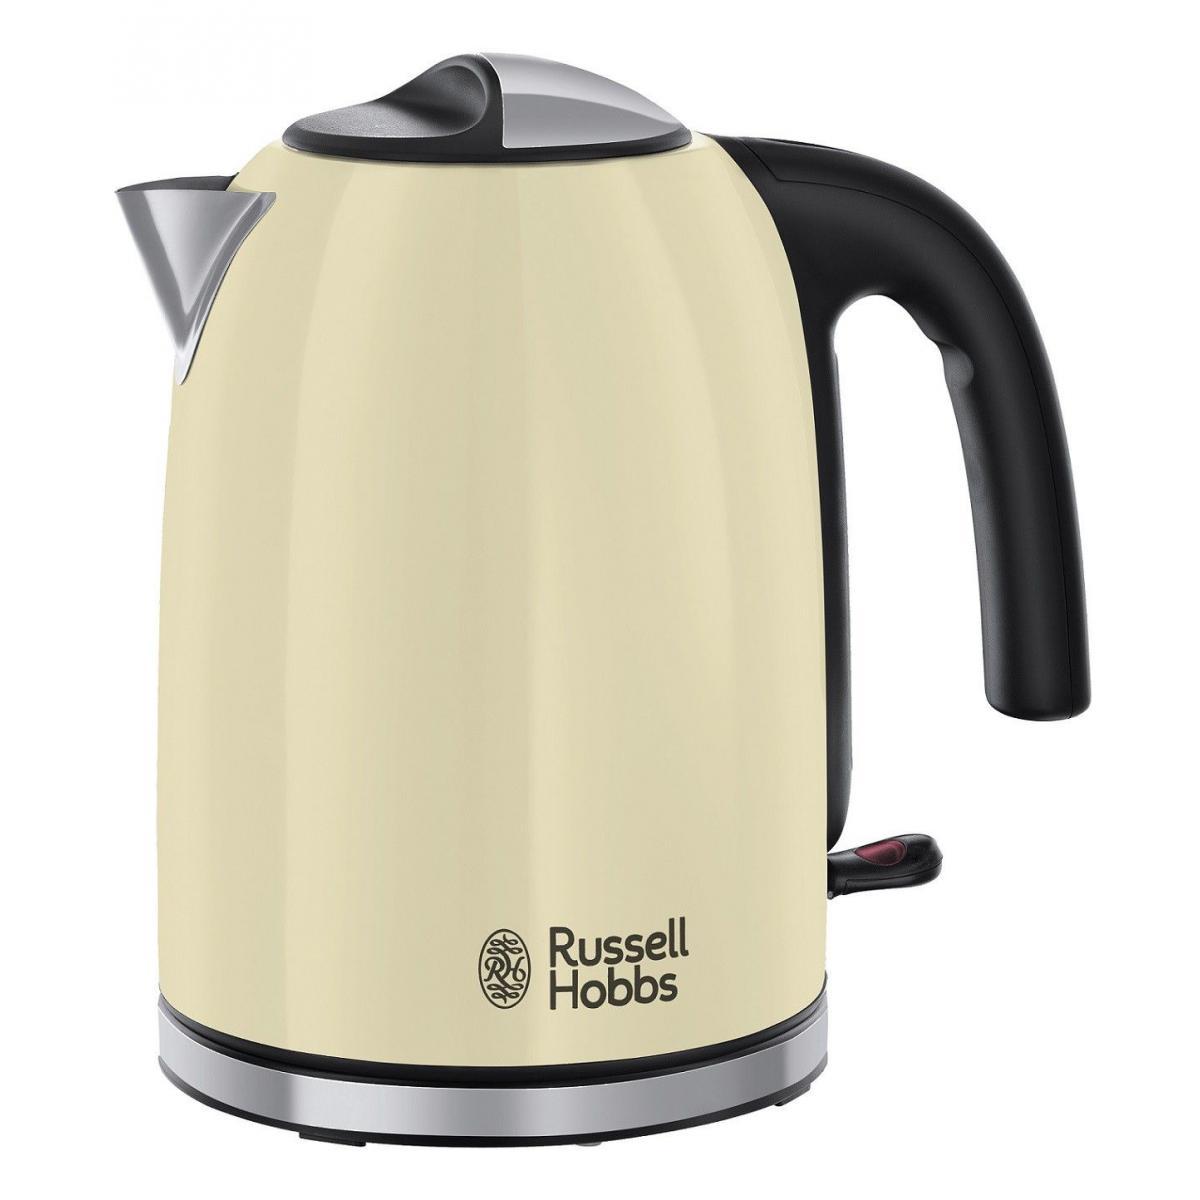 Russell Hobbs russell hobbs - 20415-70